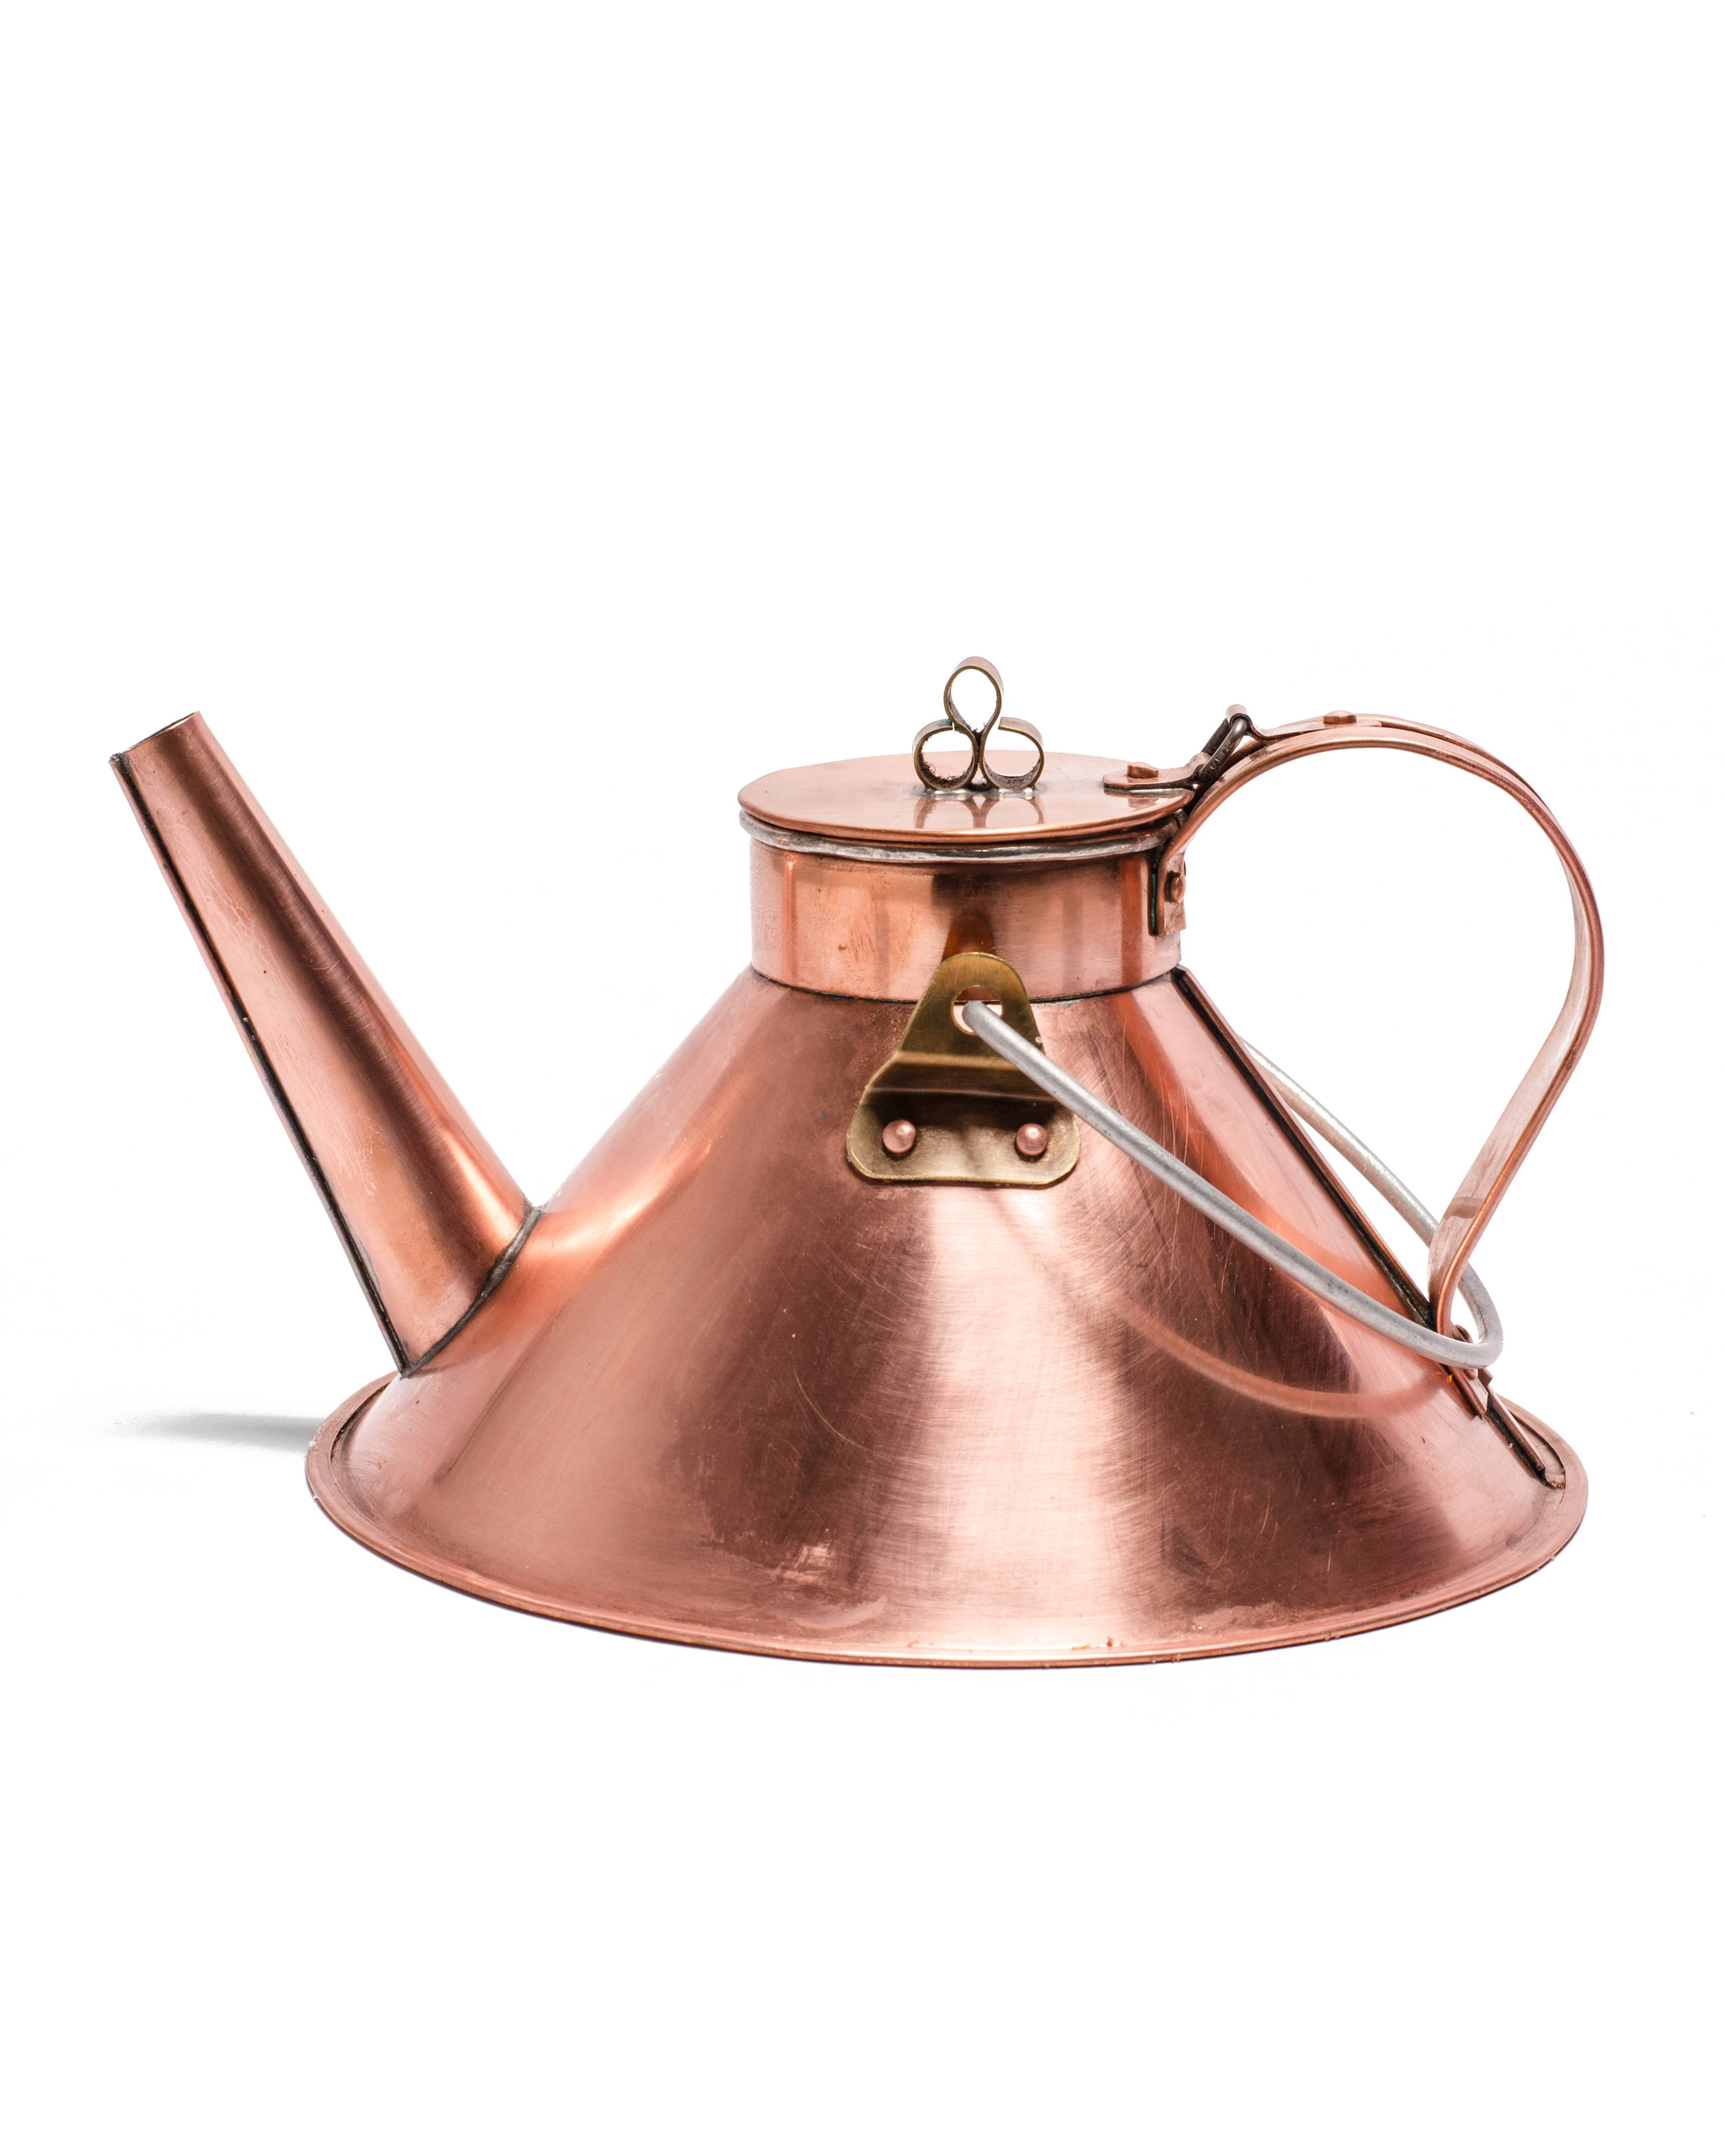 martha-bride-registry-erin-fetherston-copper-kettle-kaufmann-mercantile-0515.jpg